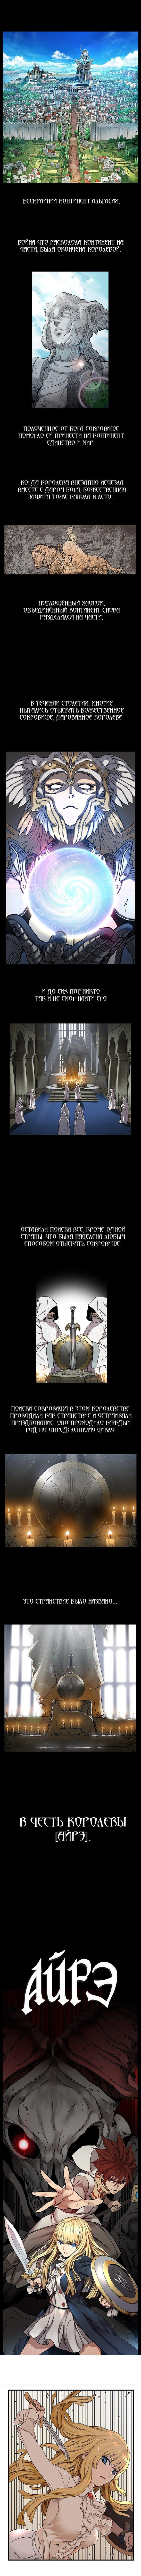 Манга Айре - Глава 1 Страница 1